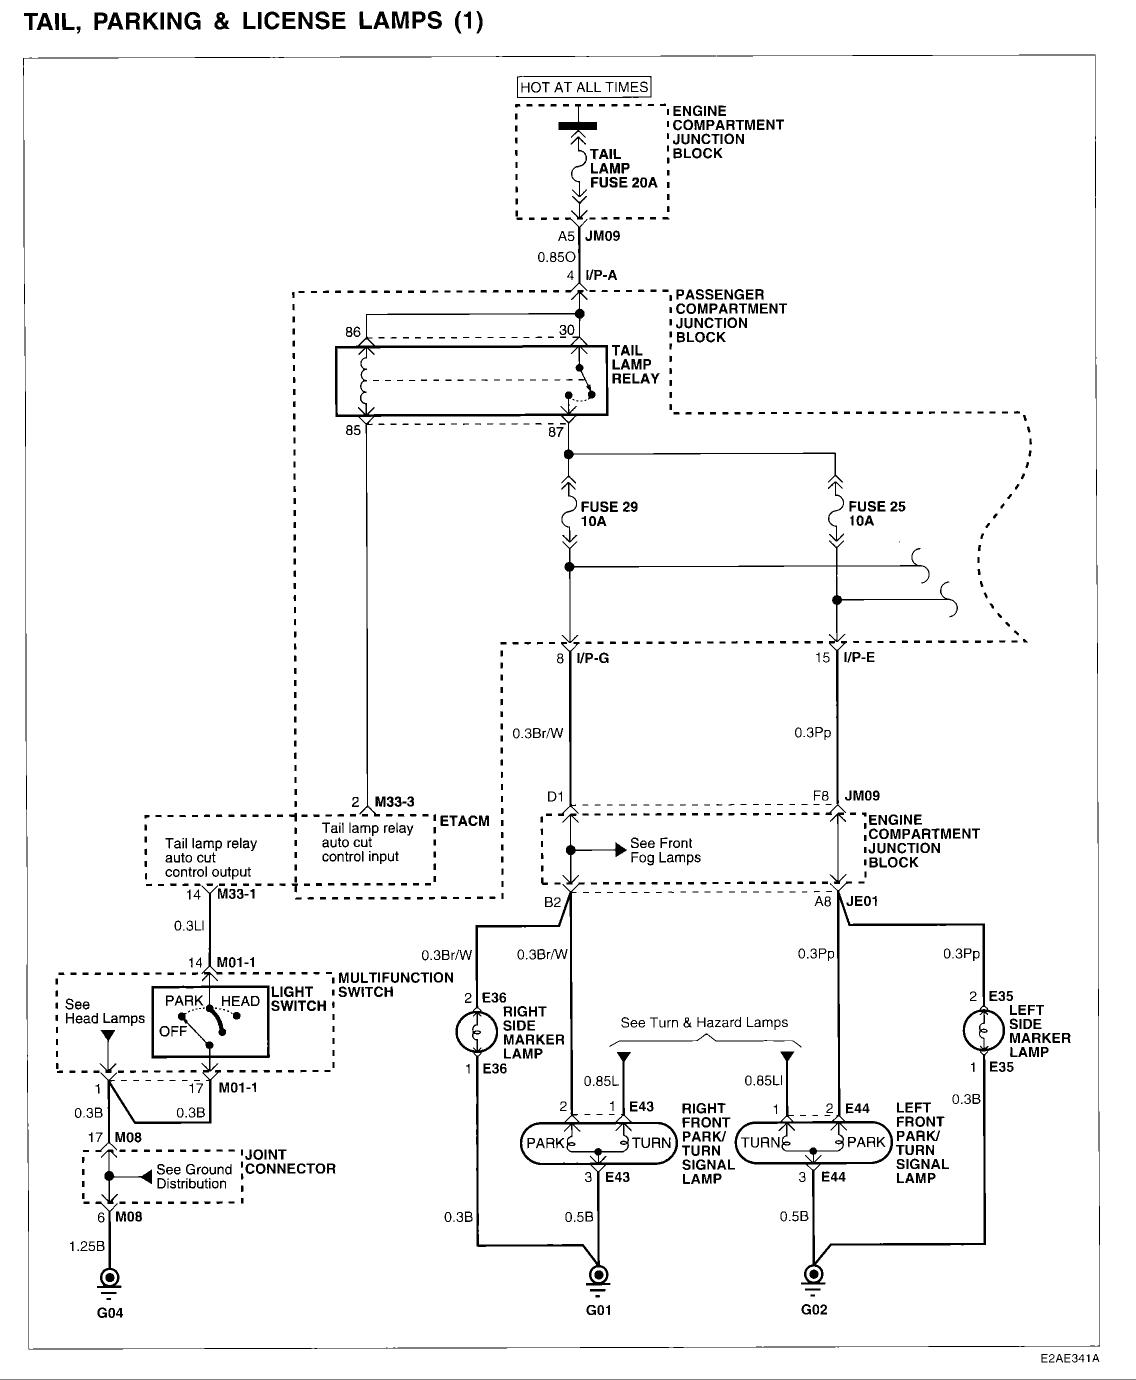 2007 hyundai accent radio wiring diagram nissan primera p12 audio 2003 sonata free